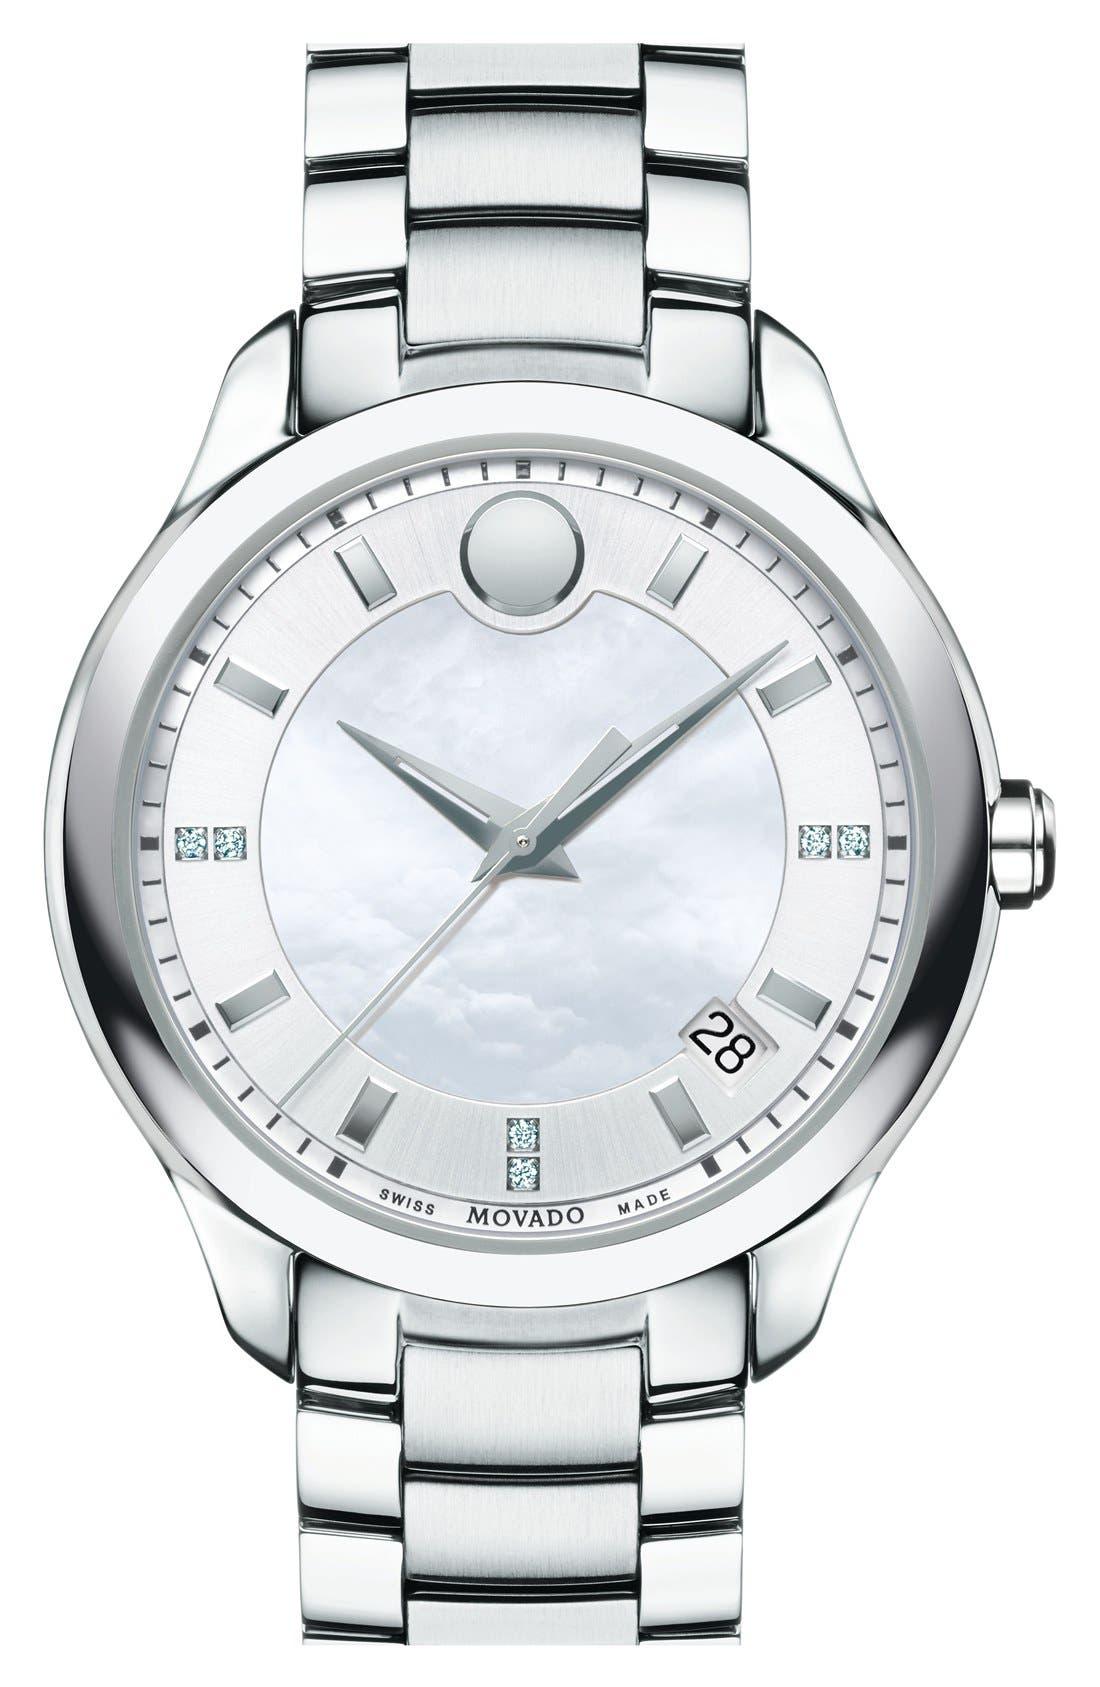 Main Image - Movado'Bellina' Bracelet Watch, 36mm